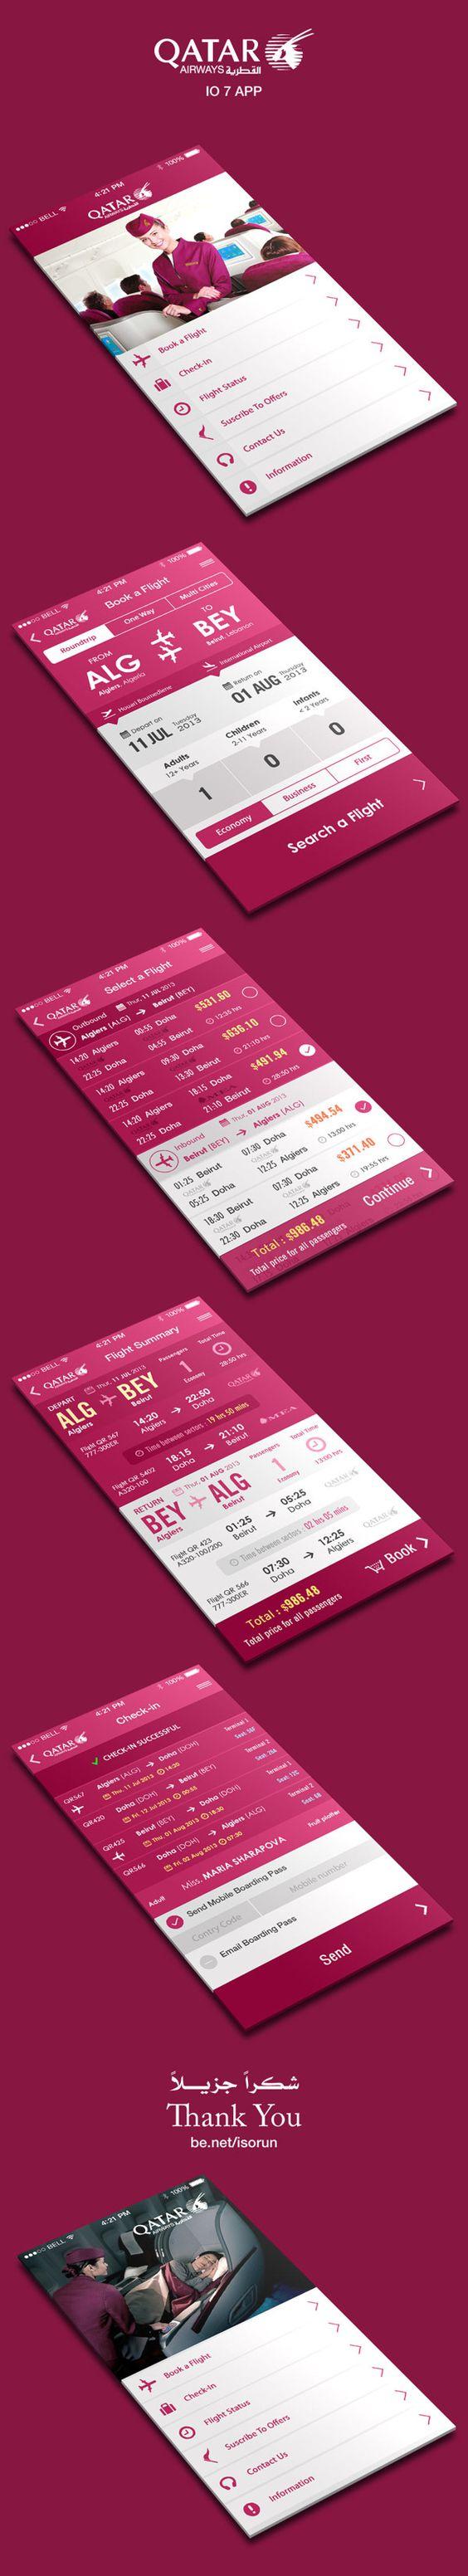 Flight Booking App IOS 7 by Yasser Achachi , via Behance